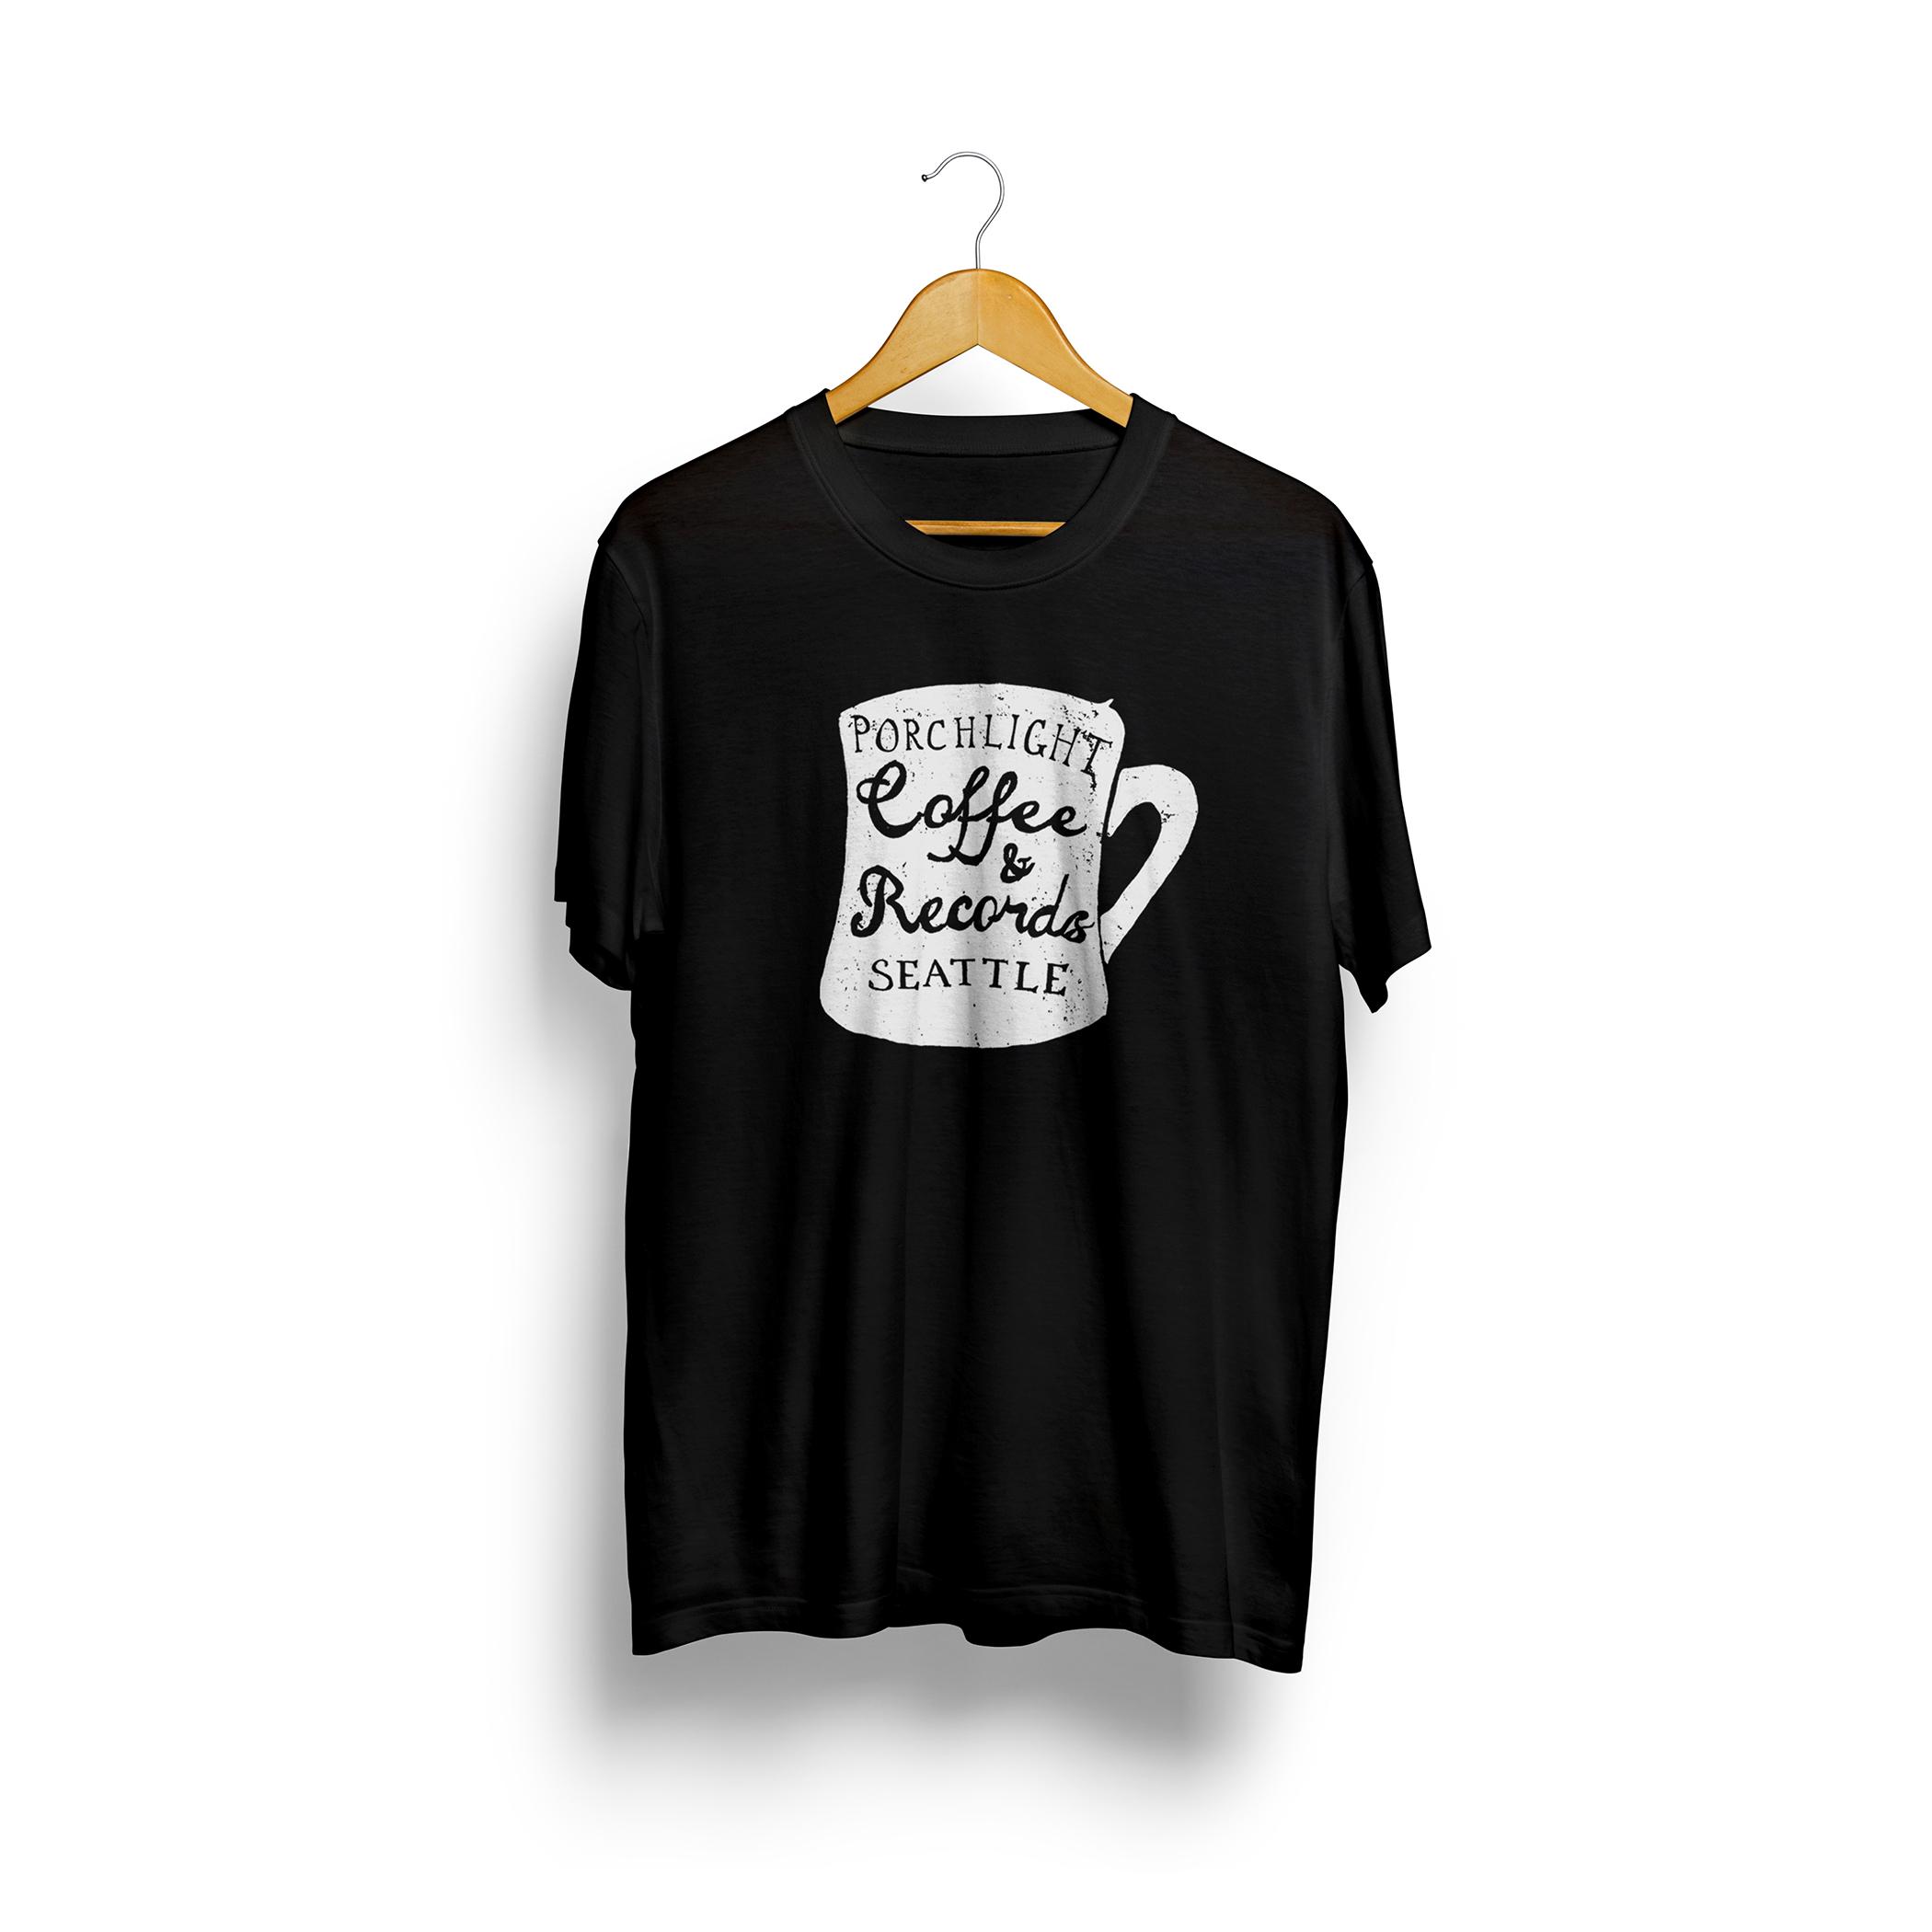 Screen Printing Shirts Houston – EDGE Engineering and